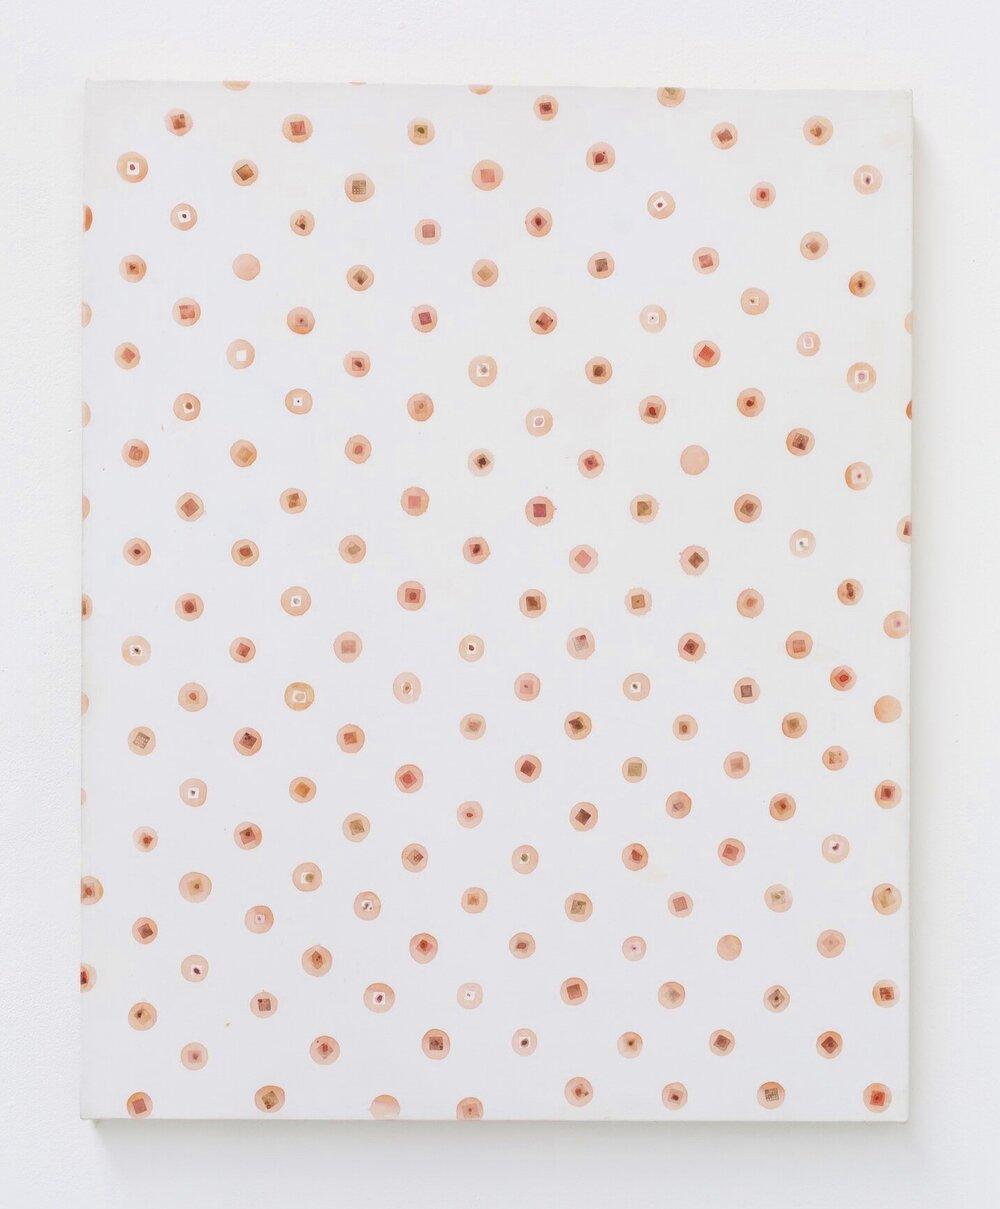 Archive (2016), acrylic on canvas, 75 x 90 cm